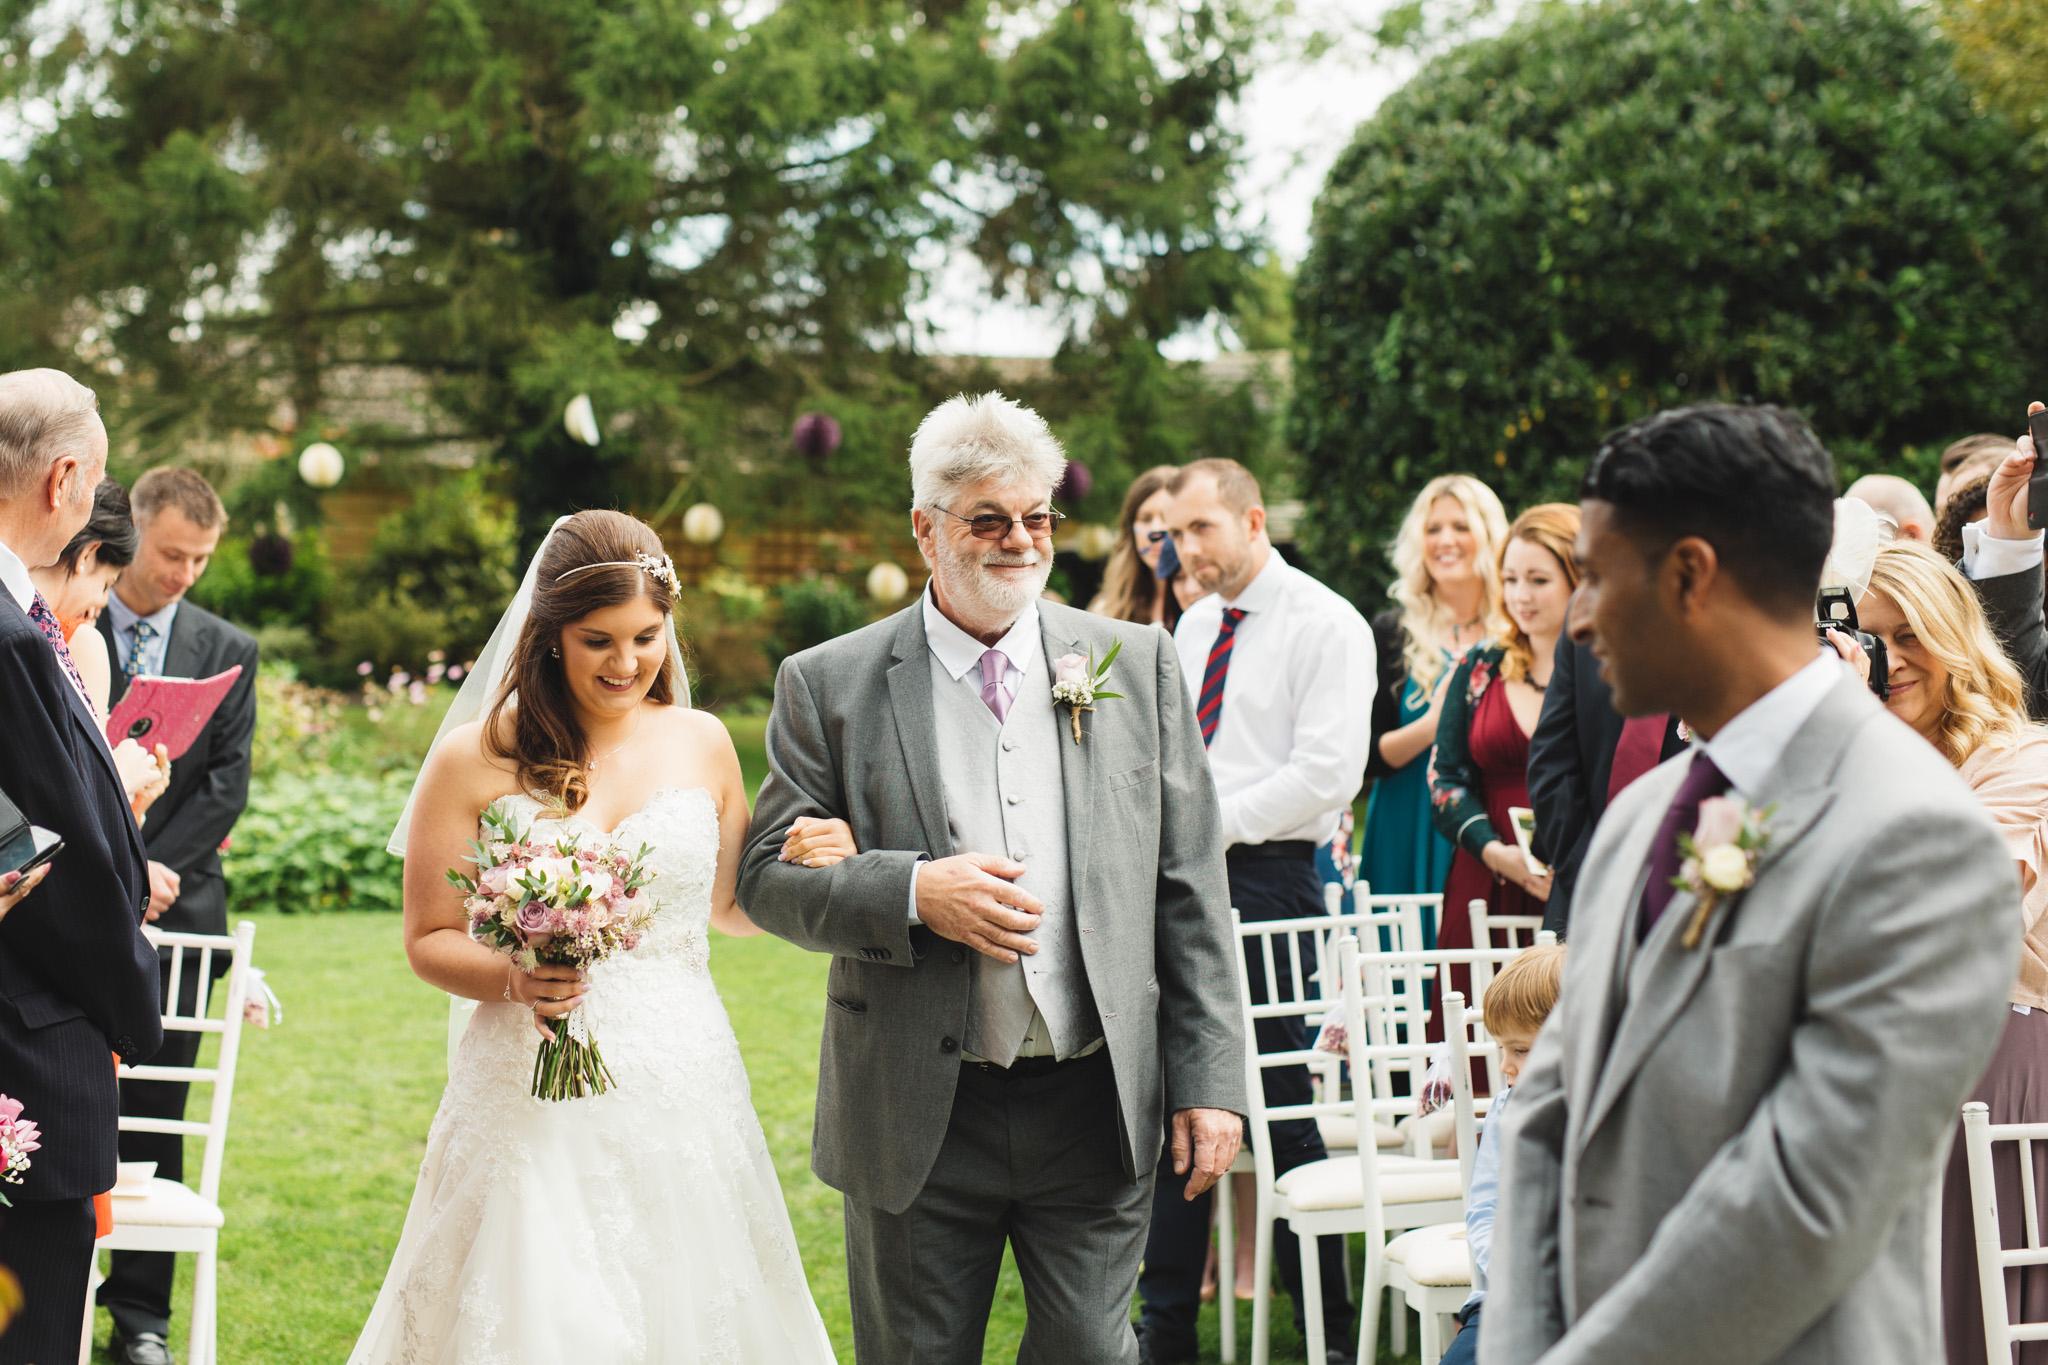 cat-lane-weddings__sheene-mill-wedding-photography__clw__1417__C5A9072.jpg